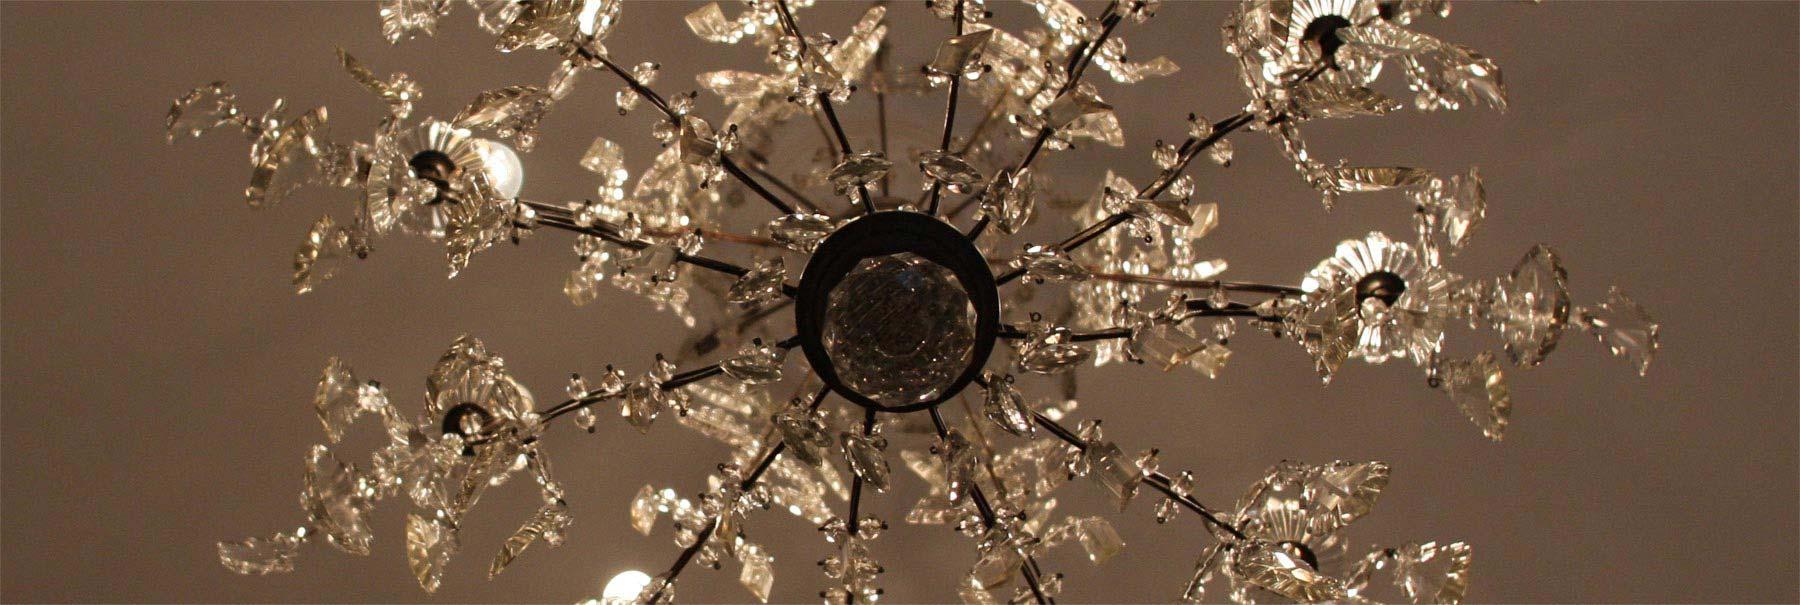 marchetti lighting. A Complete Professional Offer Marchetti Lighting